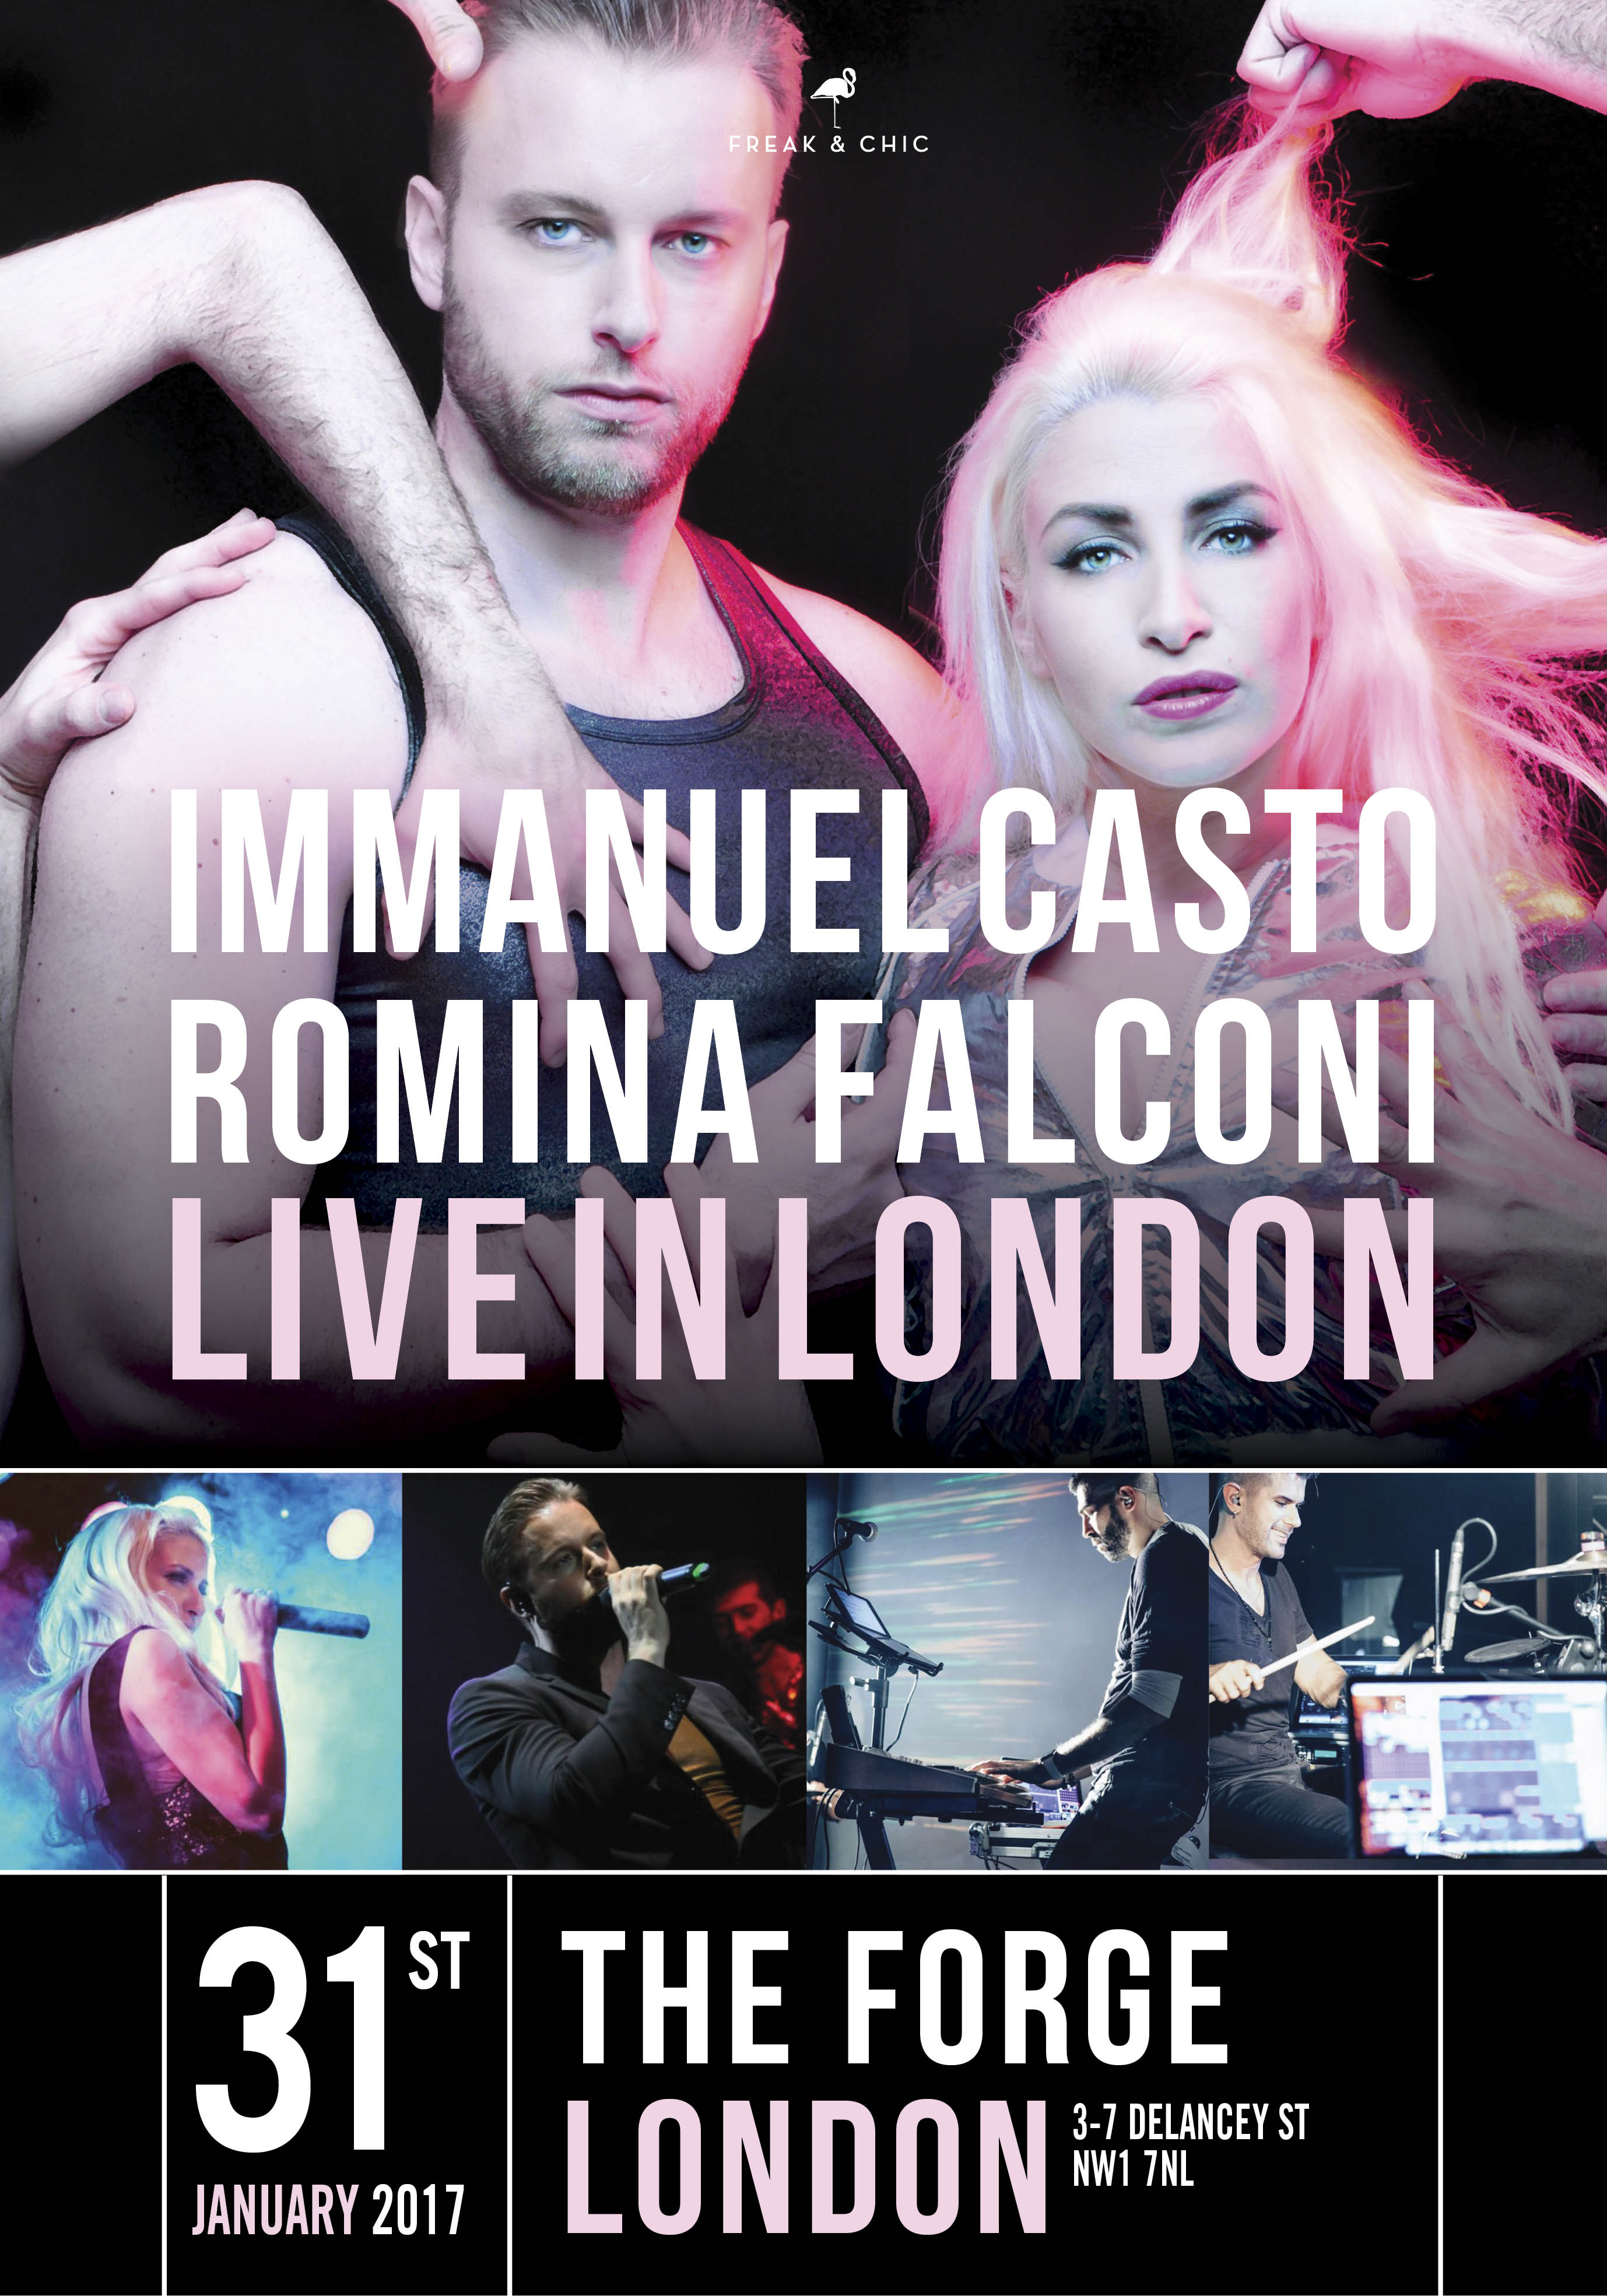 IMMANUEL CASTO e ROMINA FALCONI sbarcano a LONDRA!